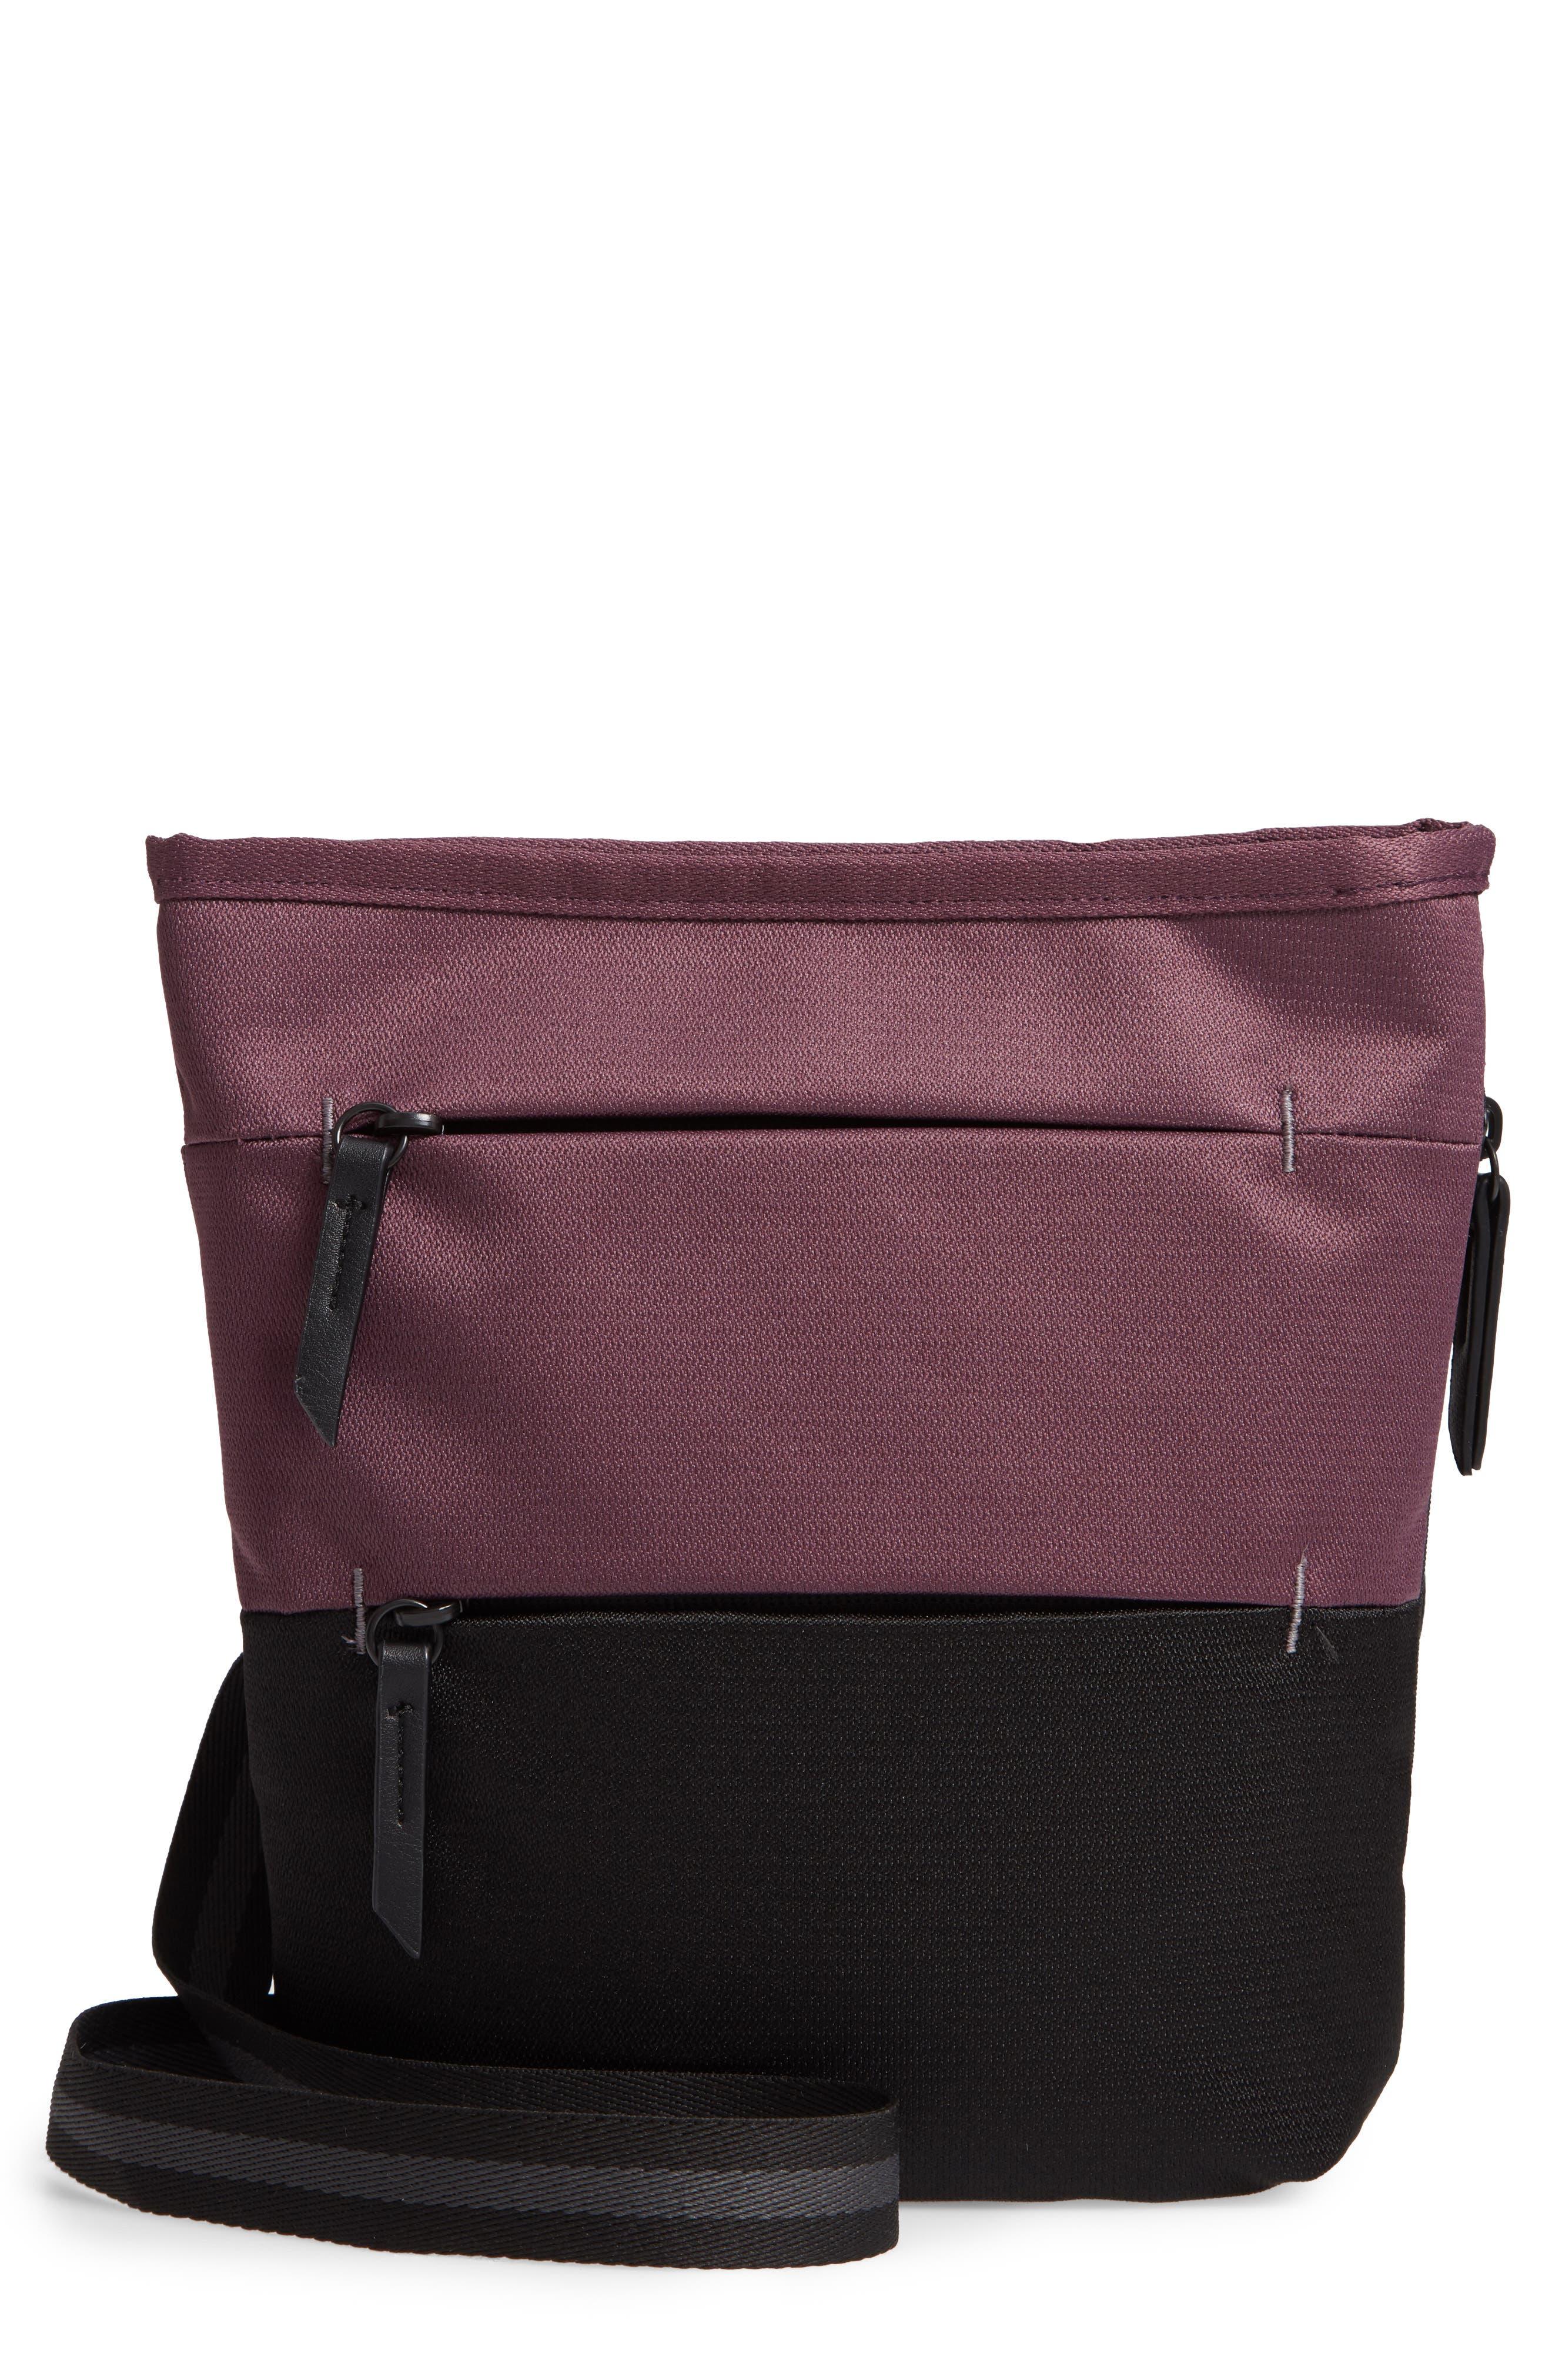 Sadie Medium RFID Crossbody Bag,                             Main thumbnail 1, color,                             PURPLE DAHLIA/ BLACK